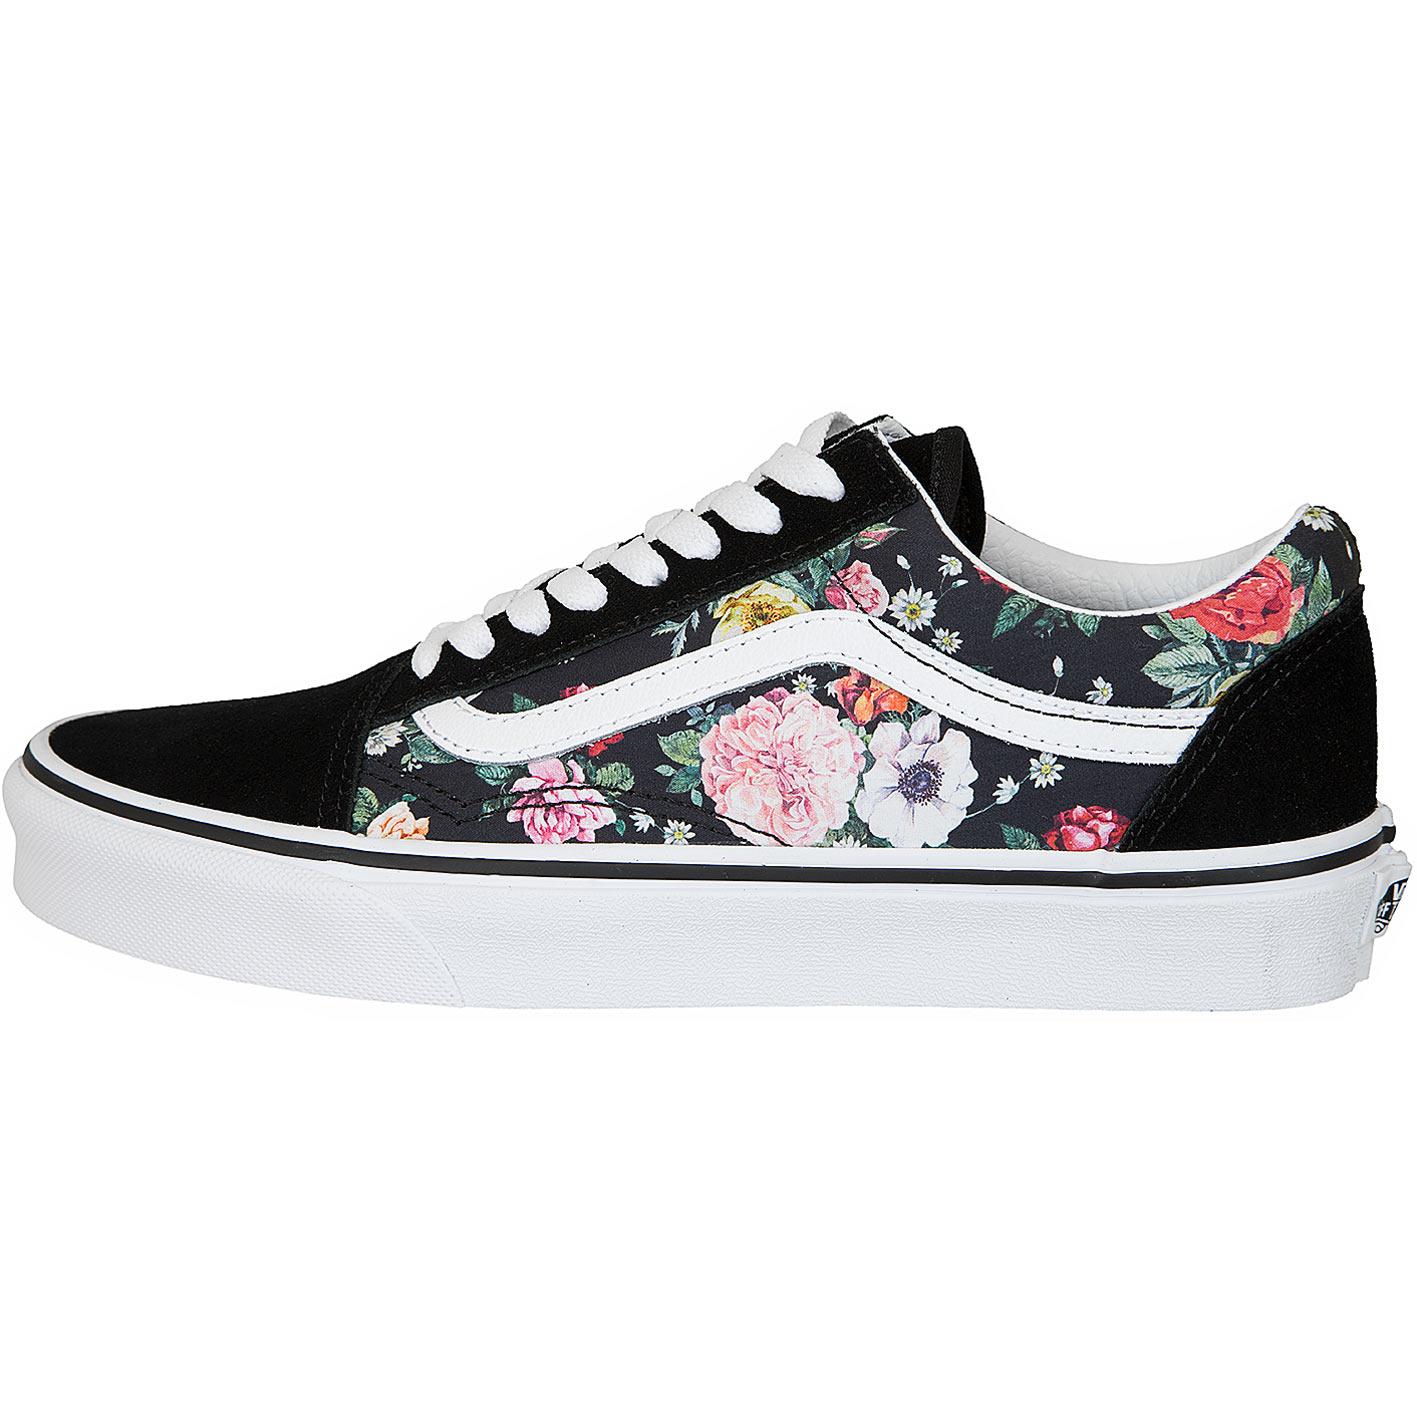 info for cbf5f dd239 Vans Damen Sneaker Old Skool Garden Floral schwarz/weiß